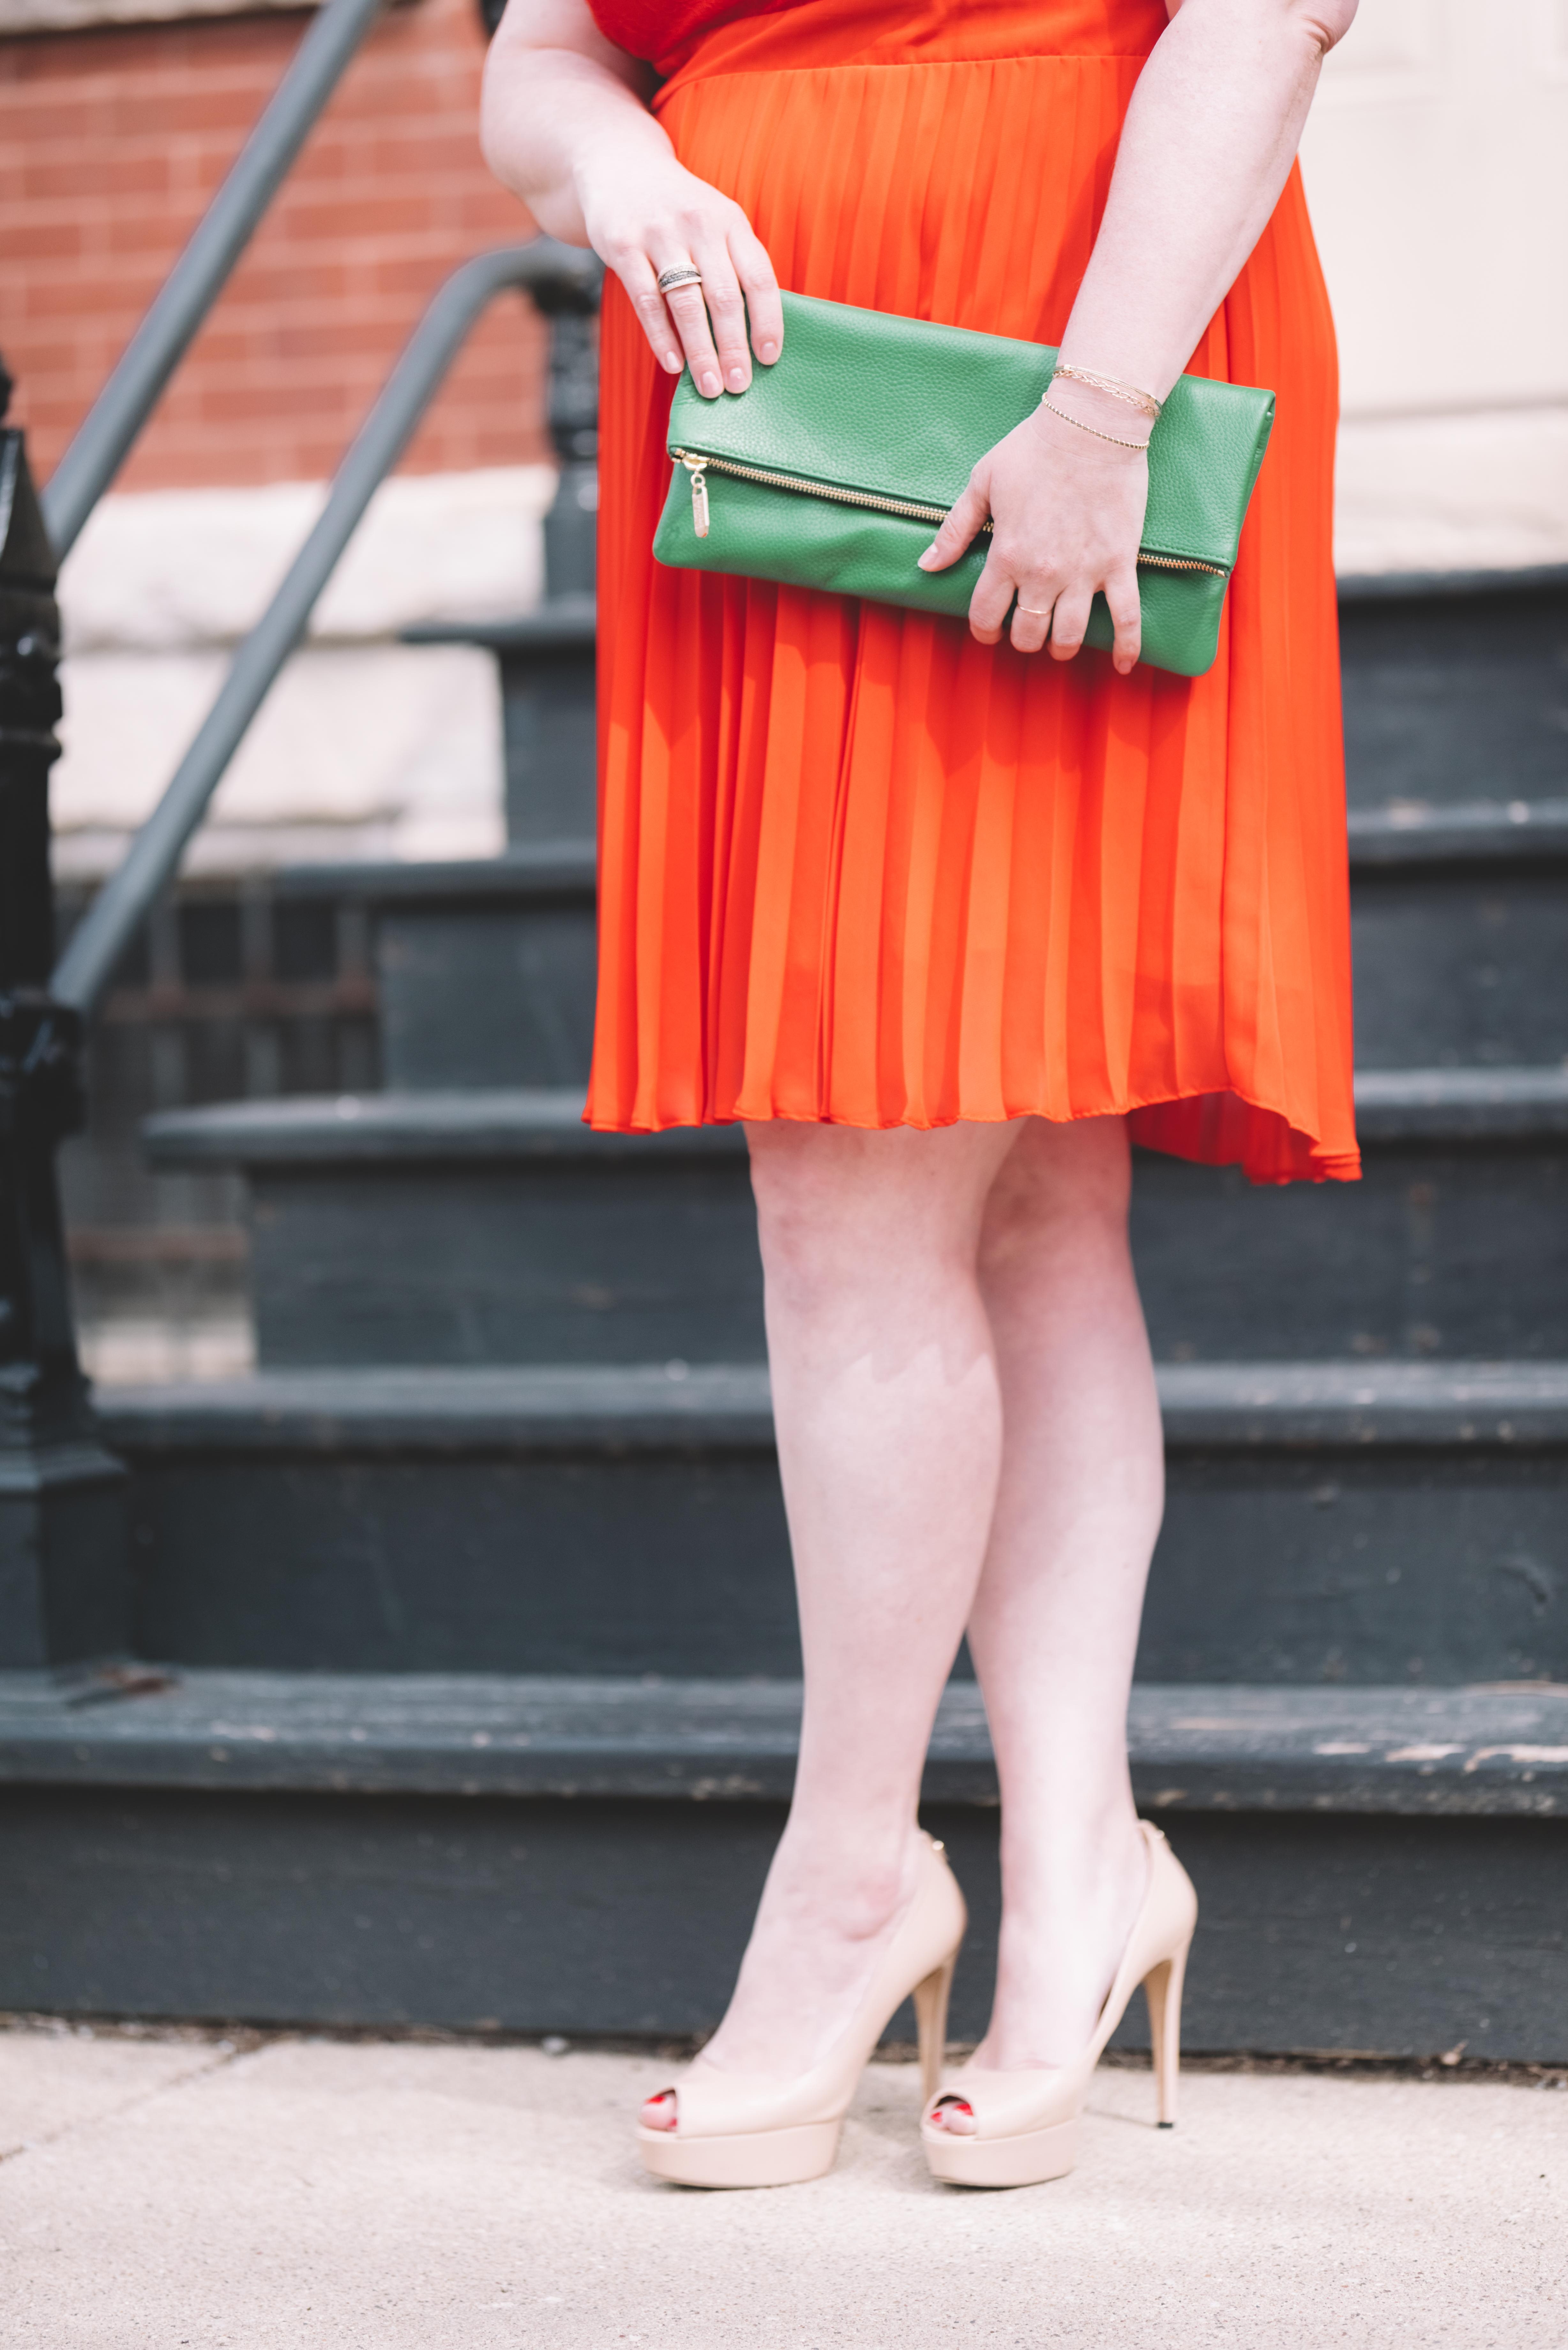 Dolce Clutch in Emerald Green Custom Leather Bag from Laudi Vidni